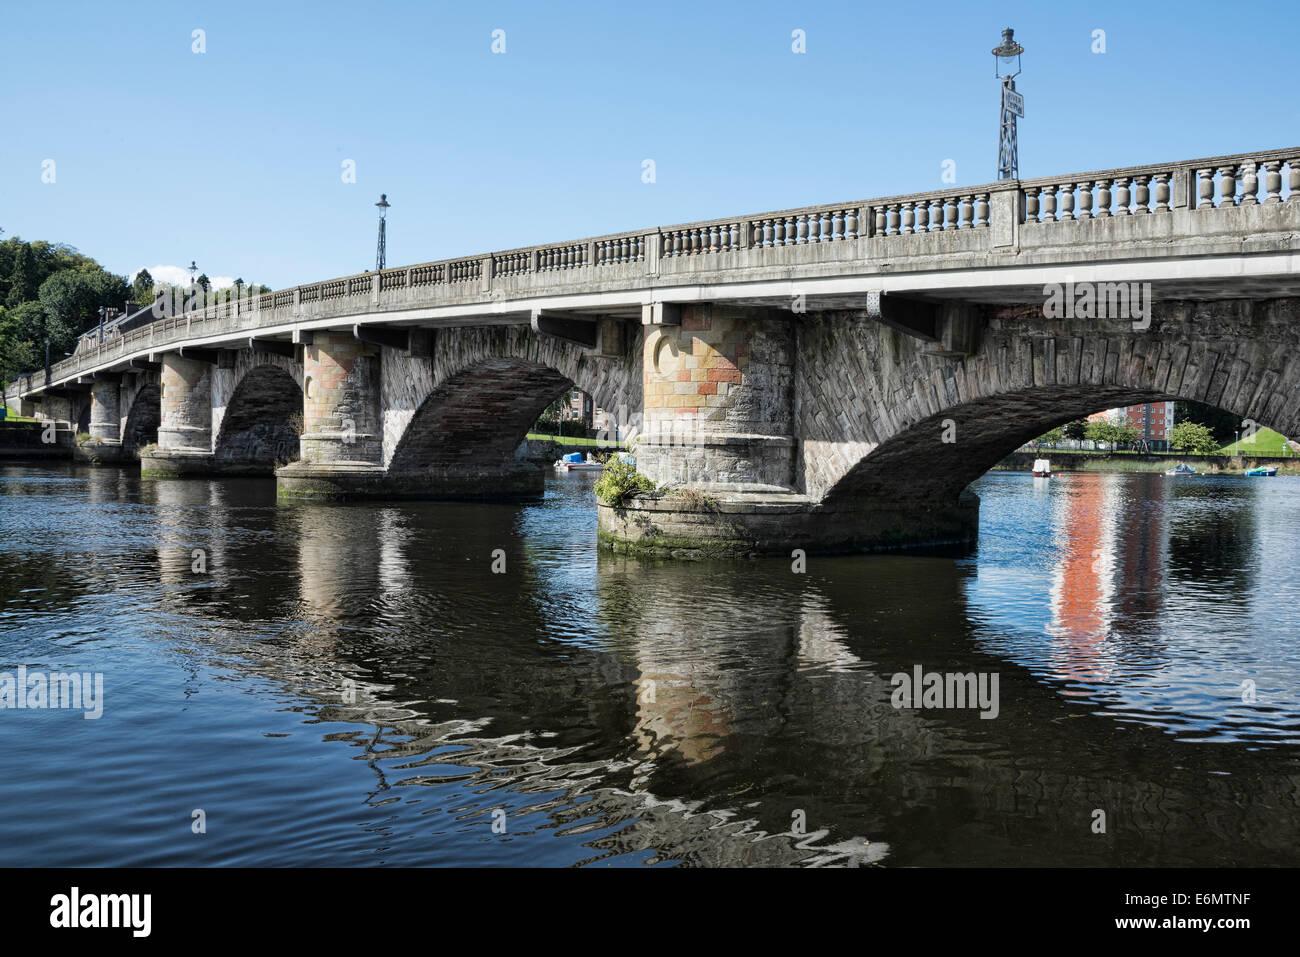 The Old Dumbarton Bridge over the River Leven - Stock Image